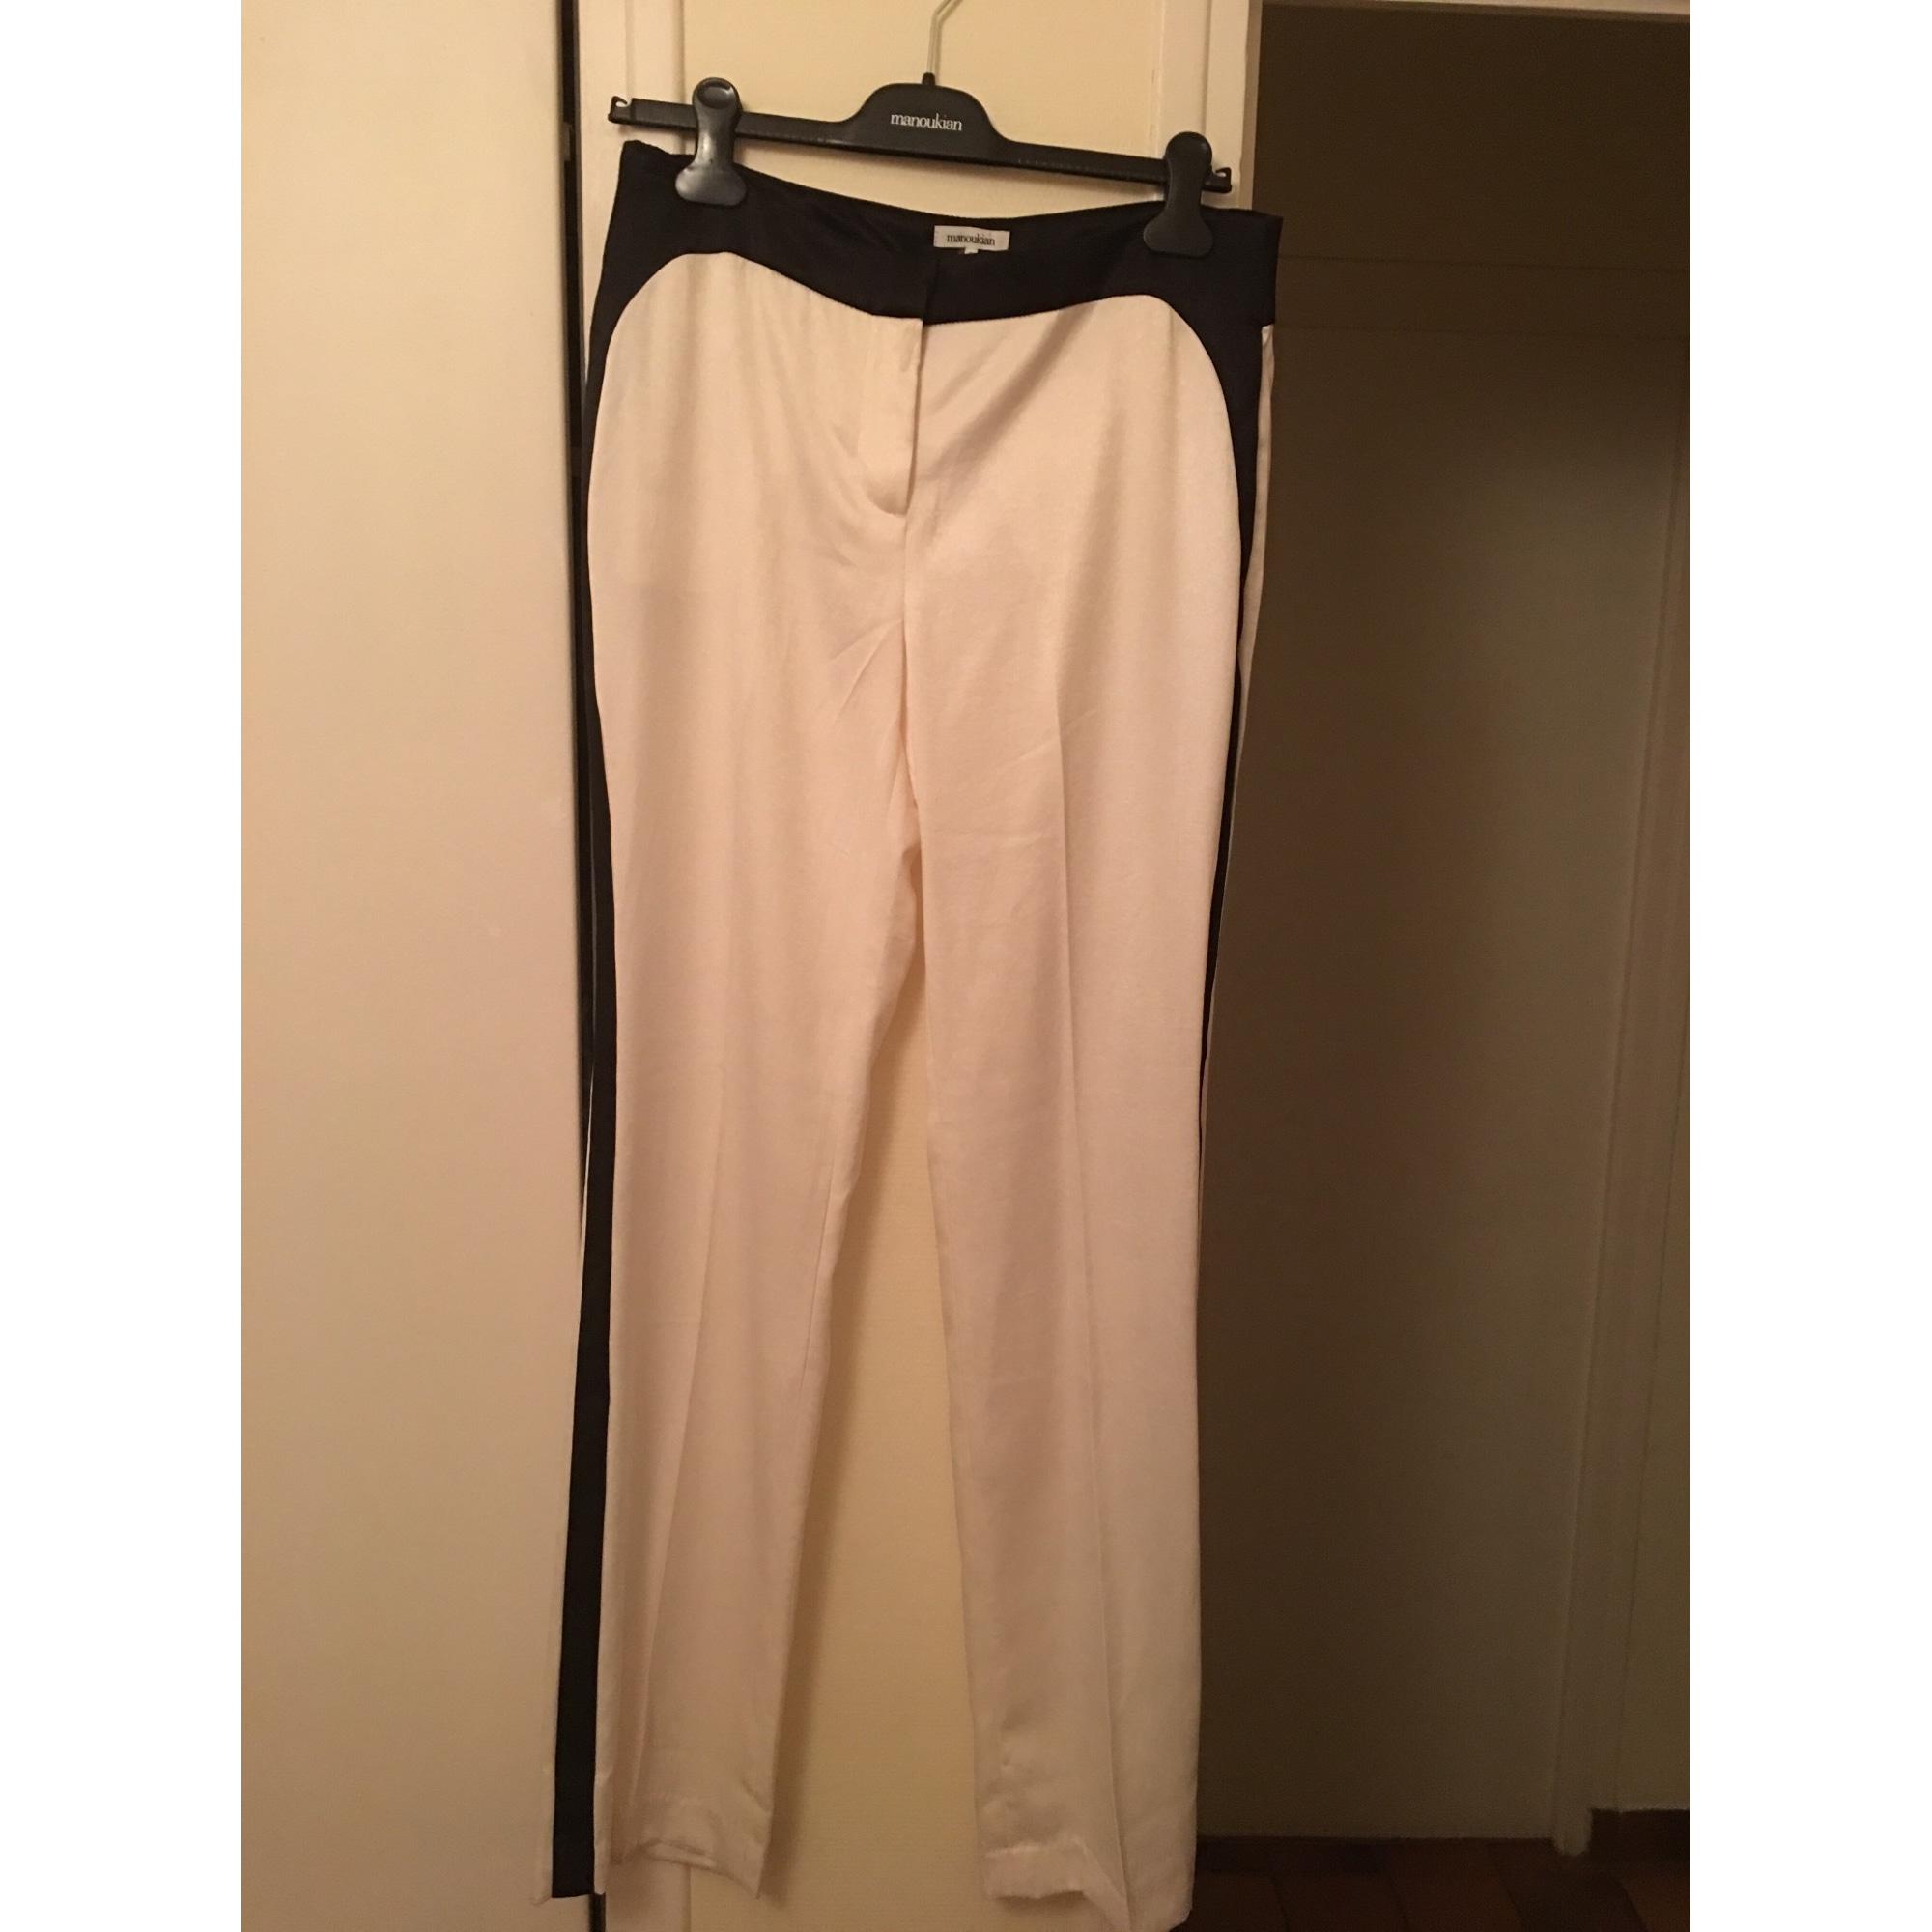 Pantalon droit ALAIN MANOUKIAN Blanc, blanc cassé, écru